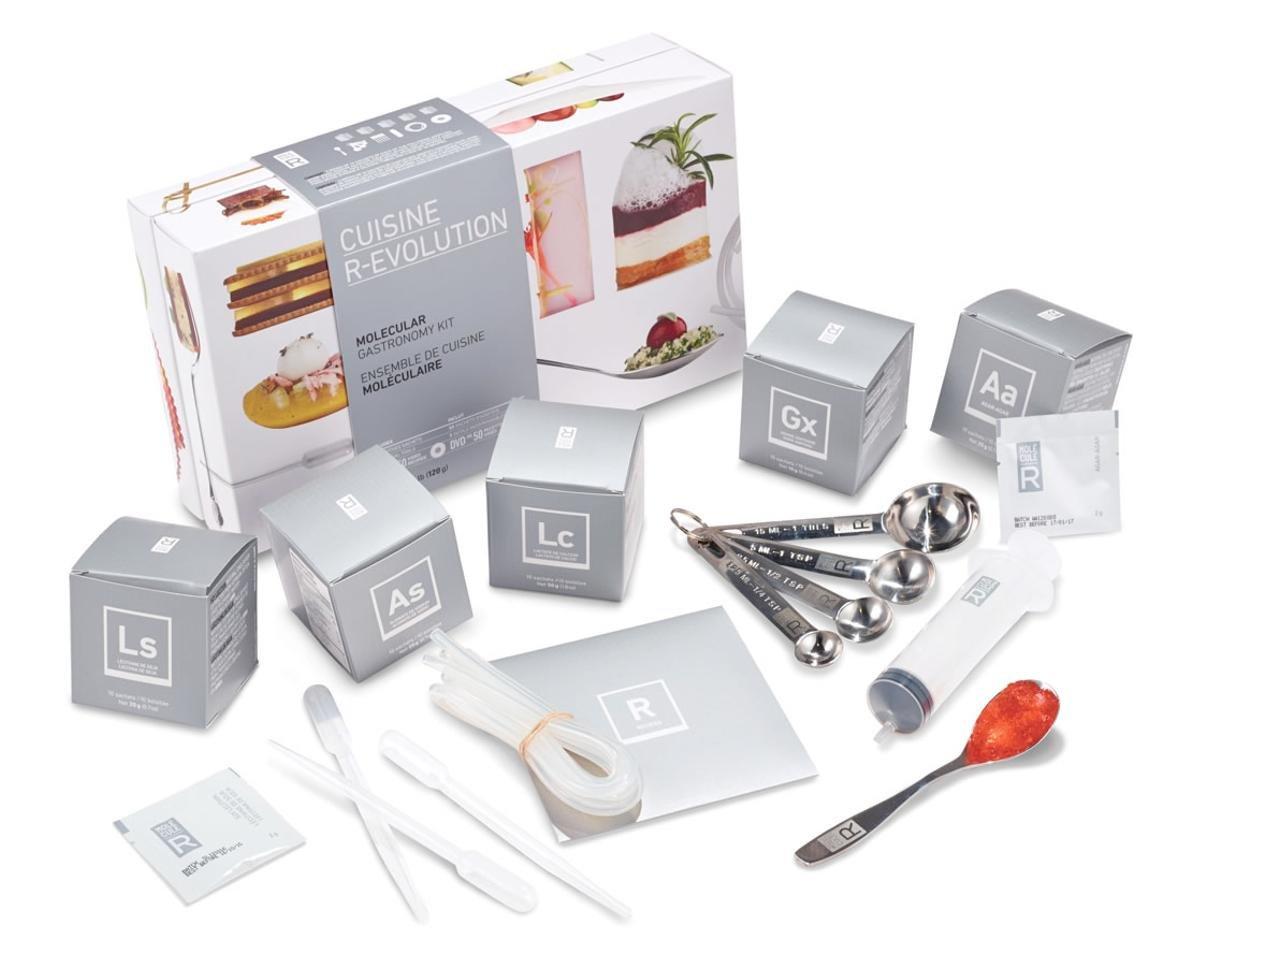 Amazon.com: Molecule-R Cuisine R-Evolution (Now With Silicon Mold ...